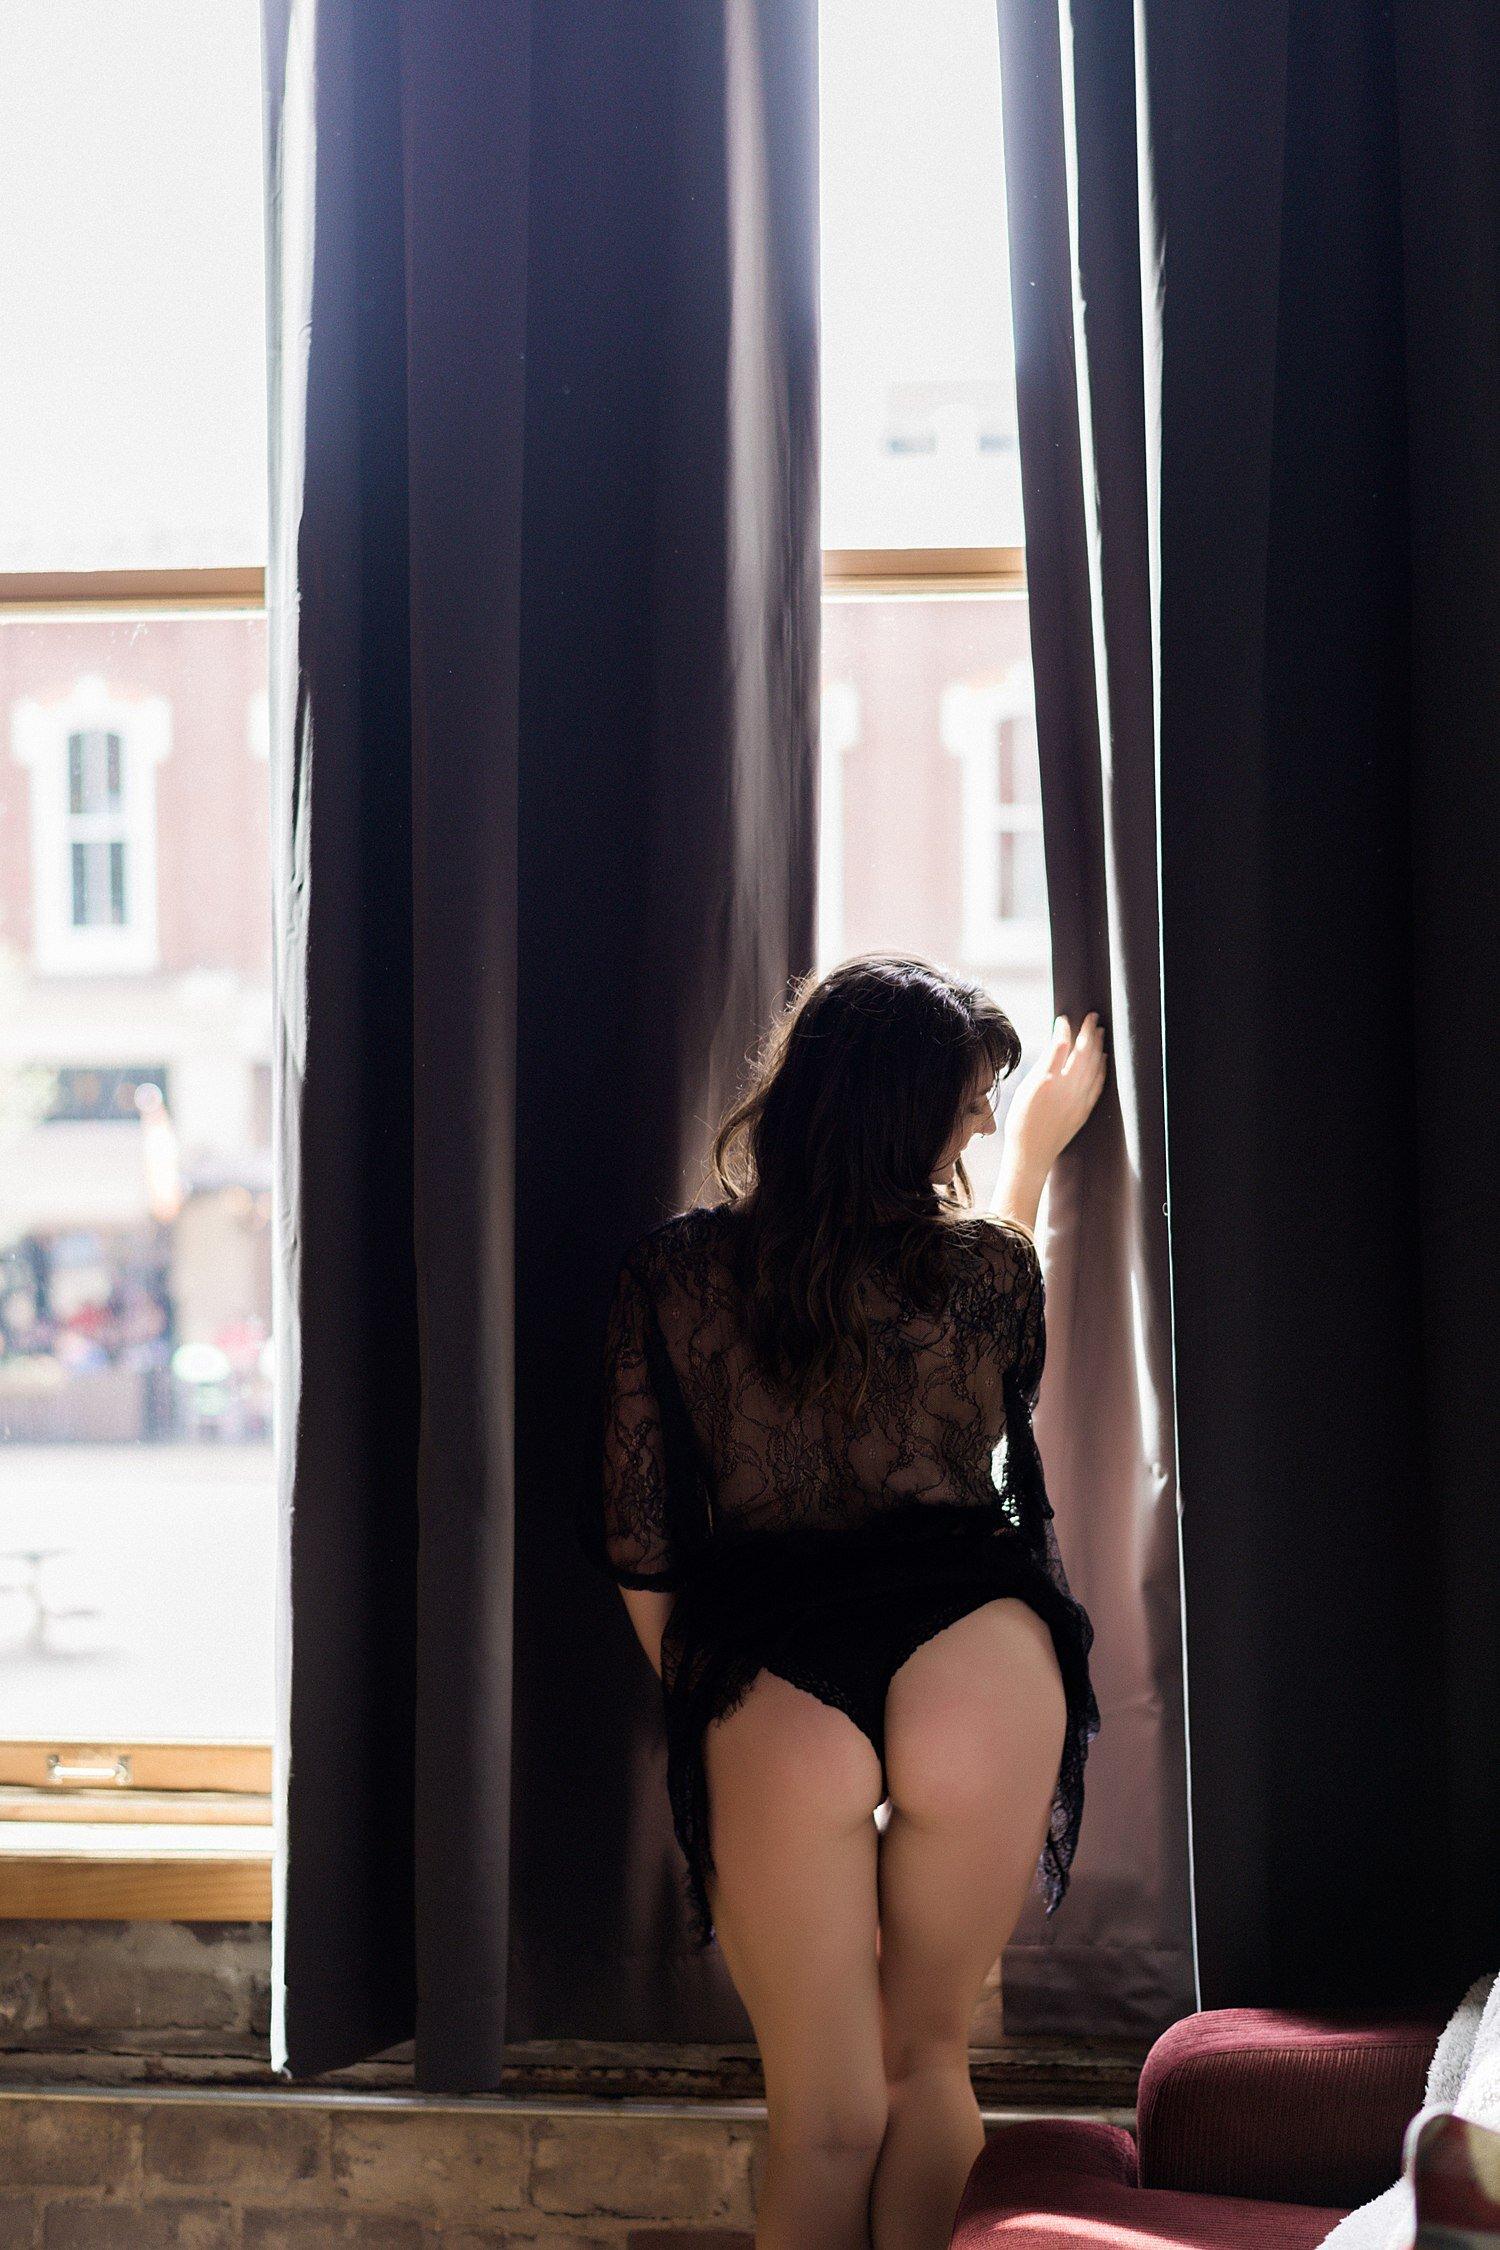 boudoir by the window